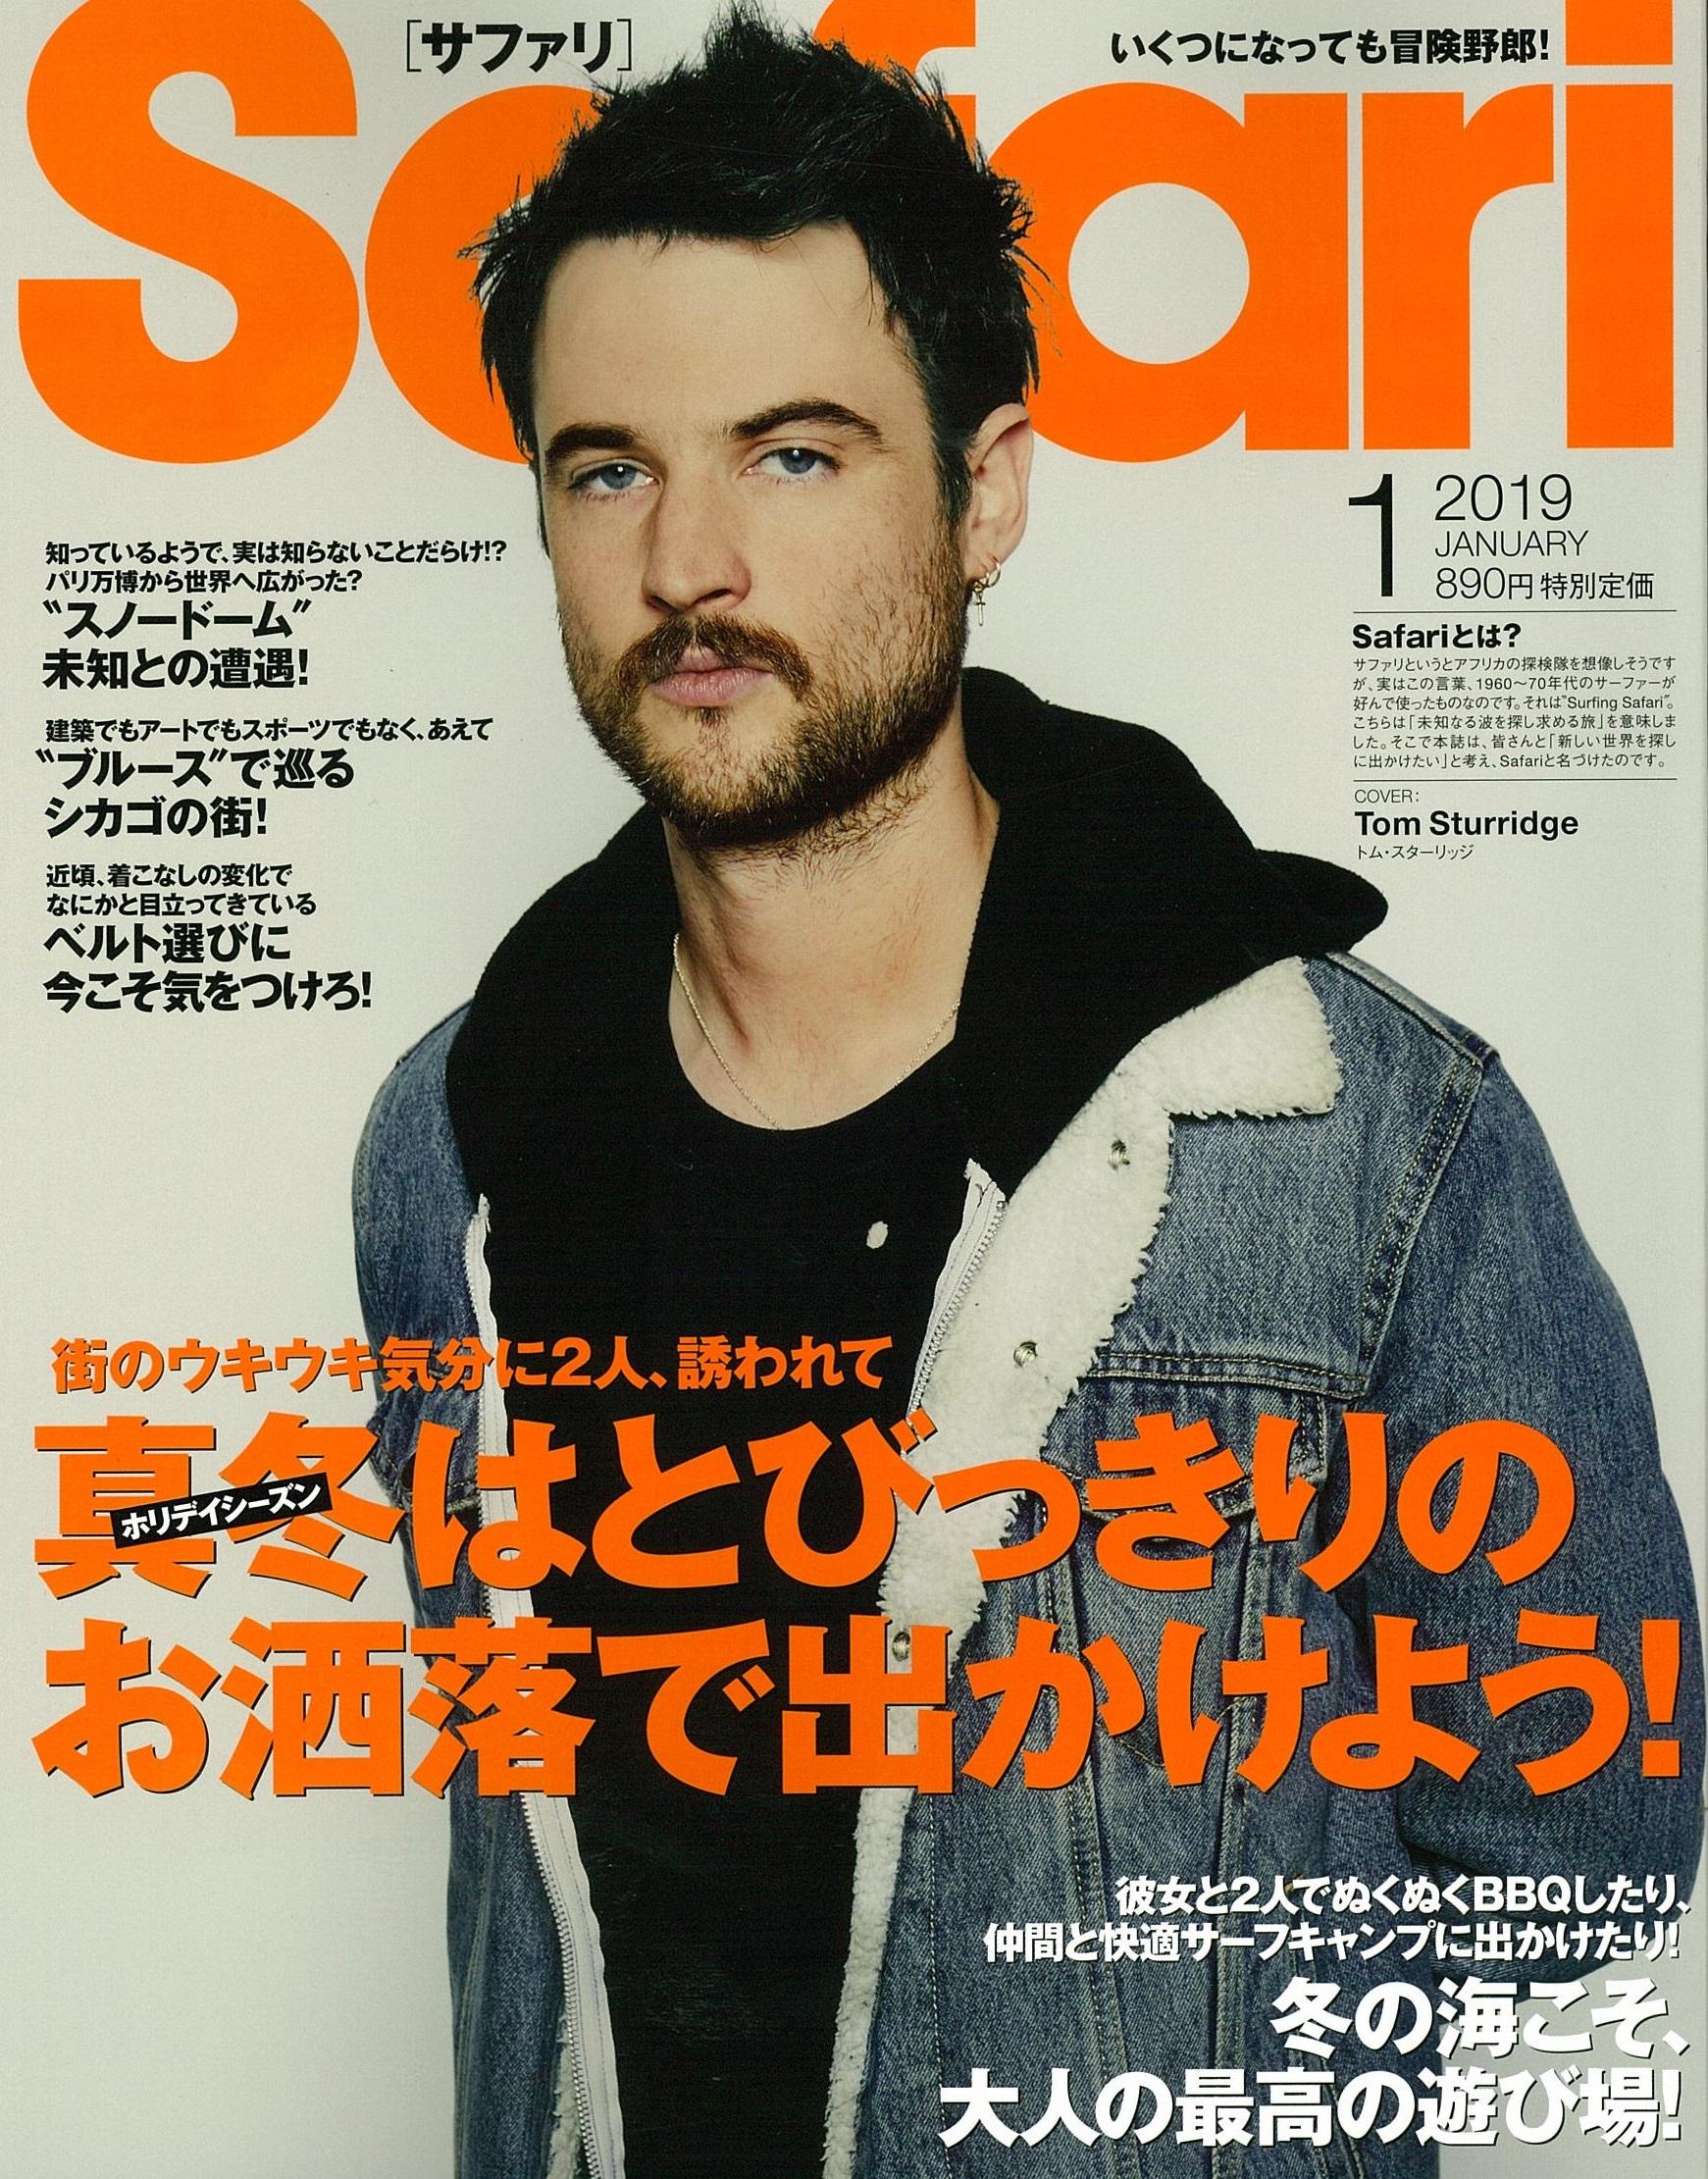 Safari 1月号掲載